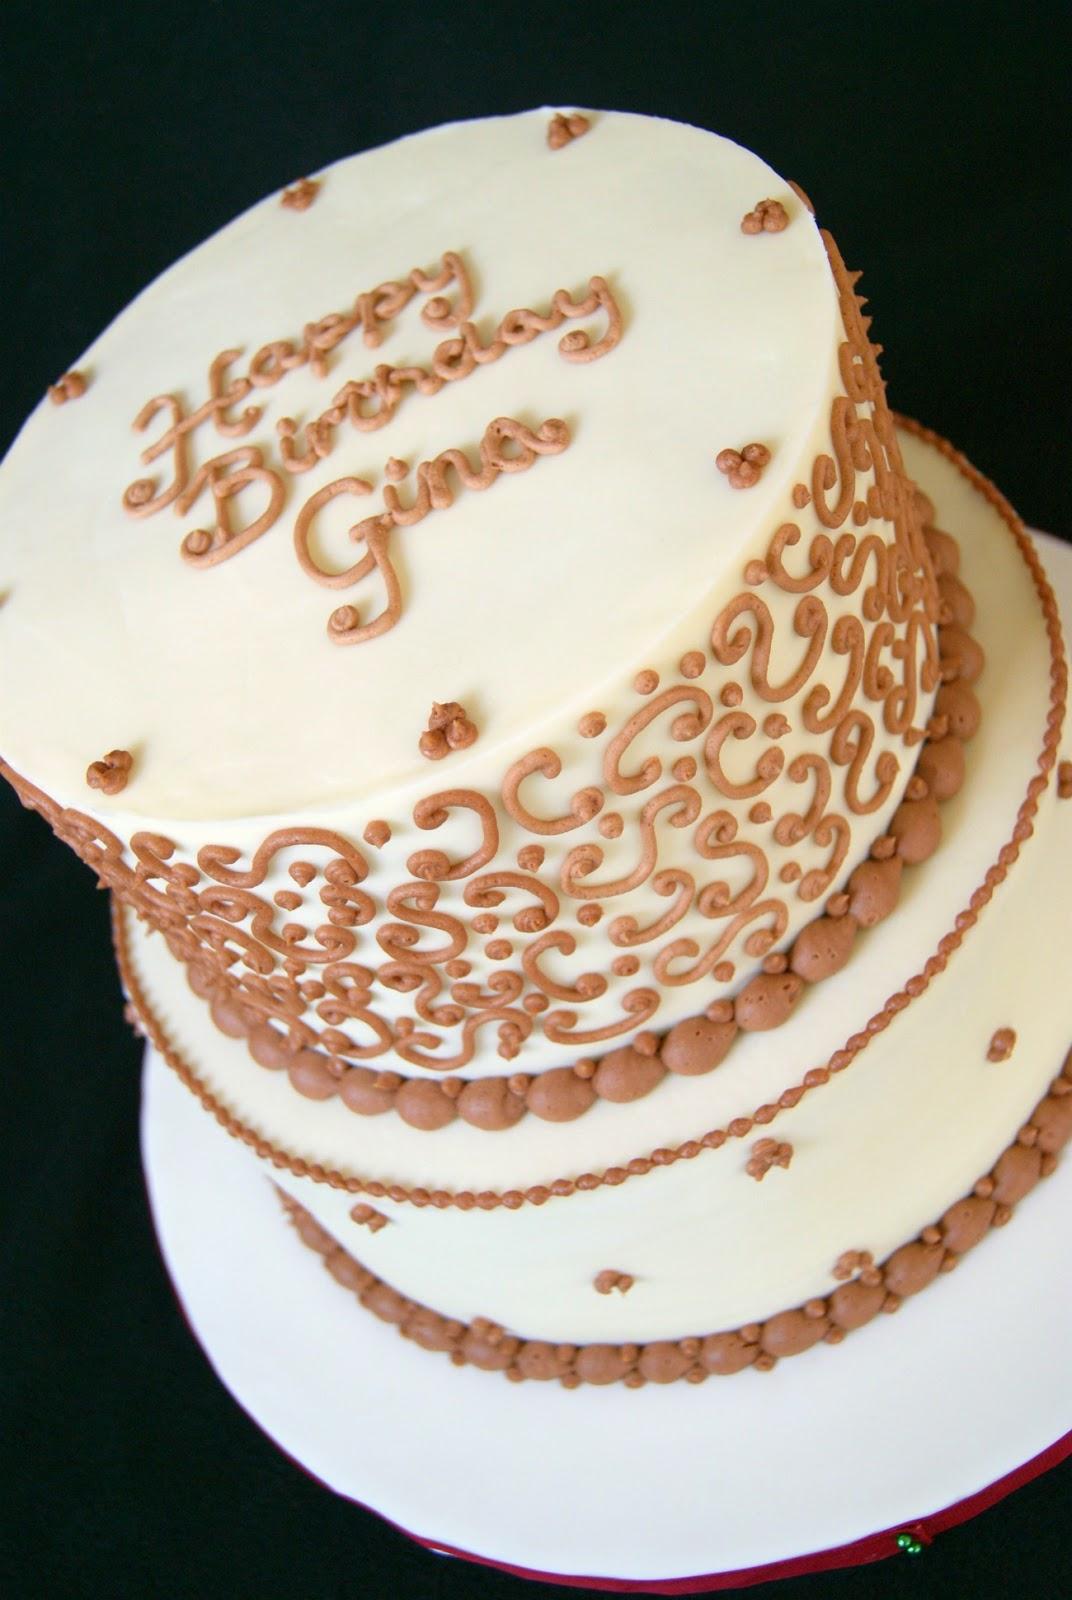 50th Birthday Cake Long Island Be Nourished Now Inc Wellness